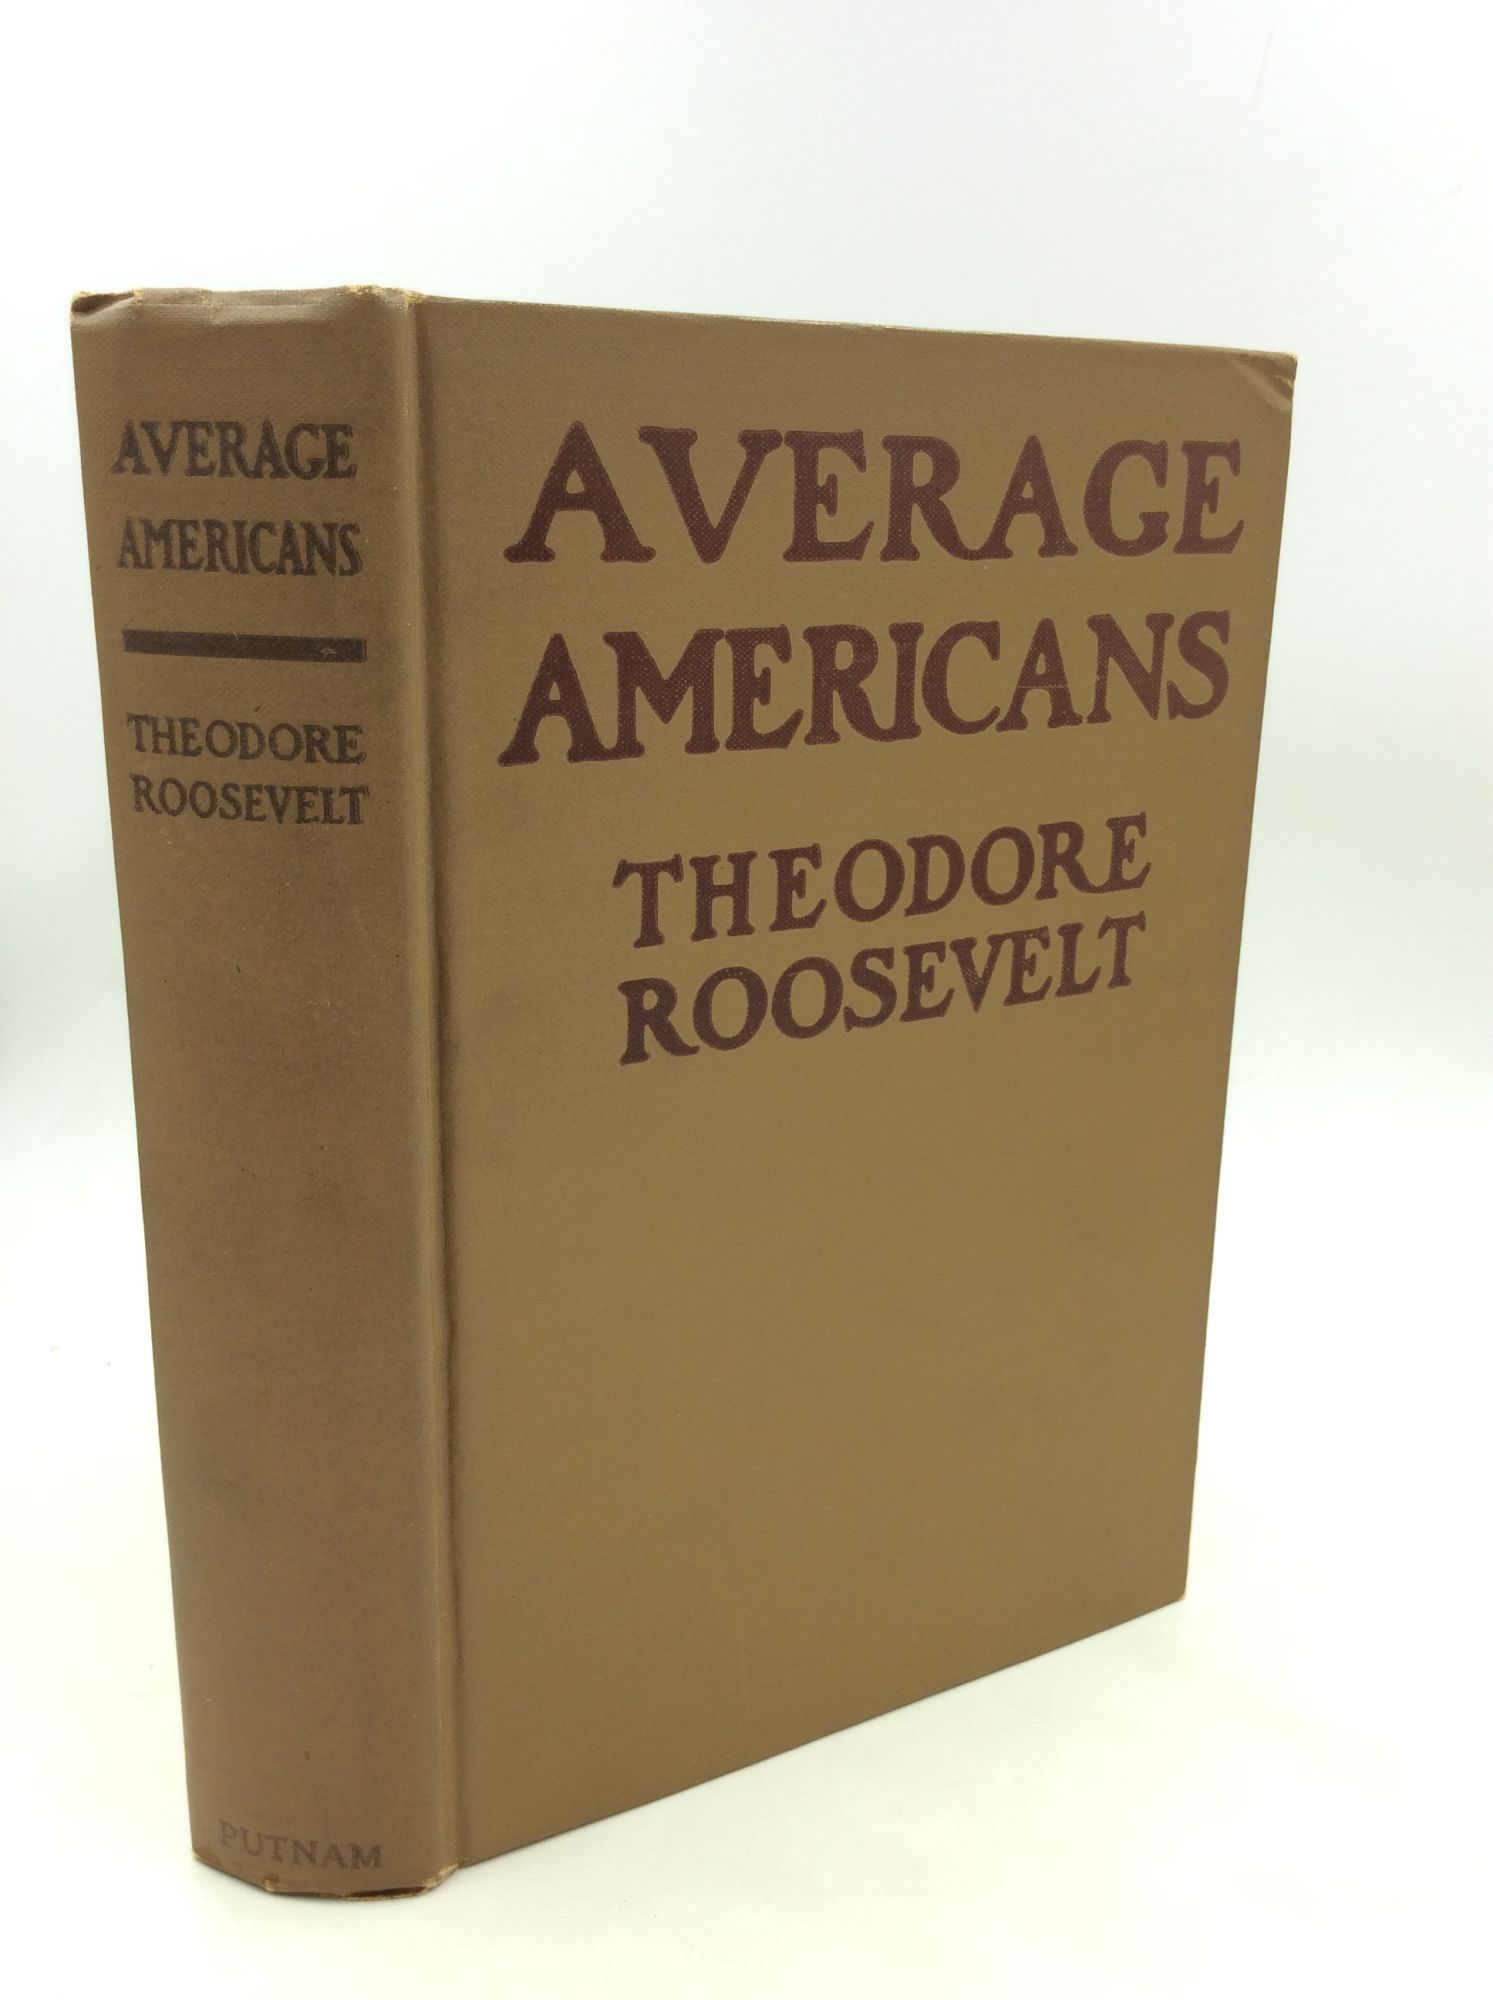 AVERAGE AMERICANS: Theodore Roosevelt, Jr.